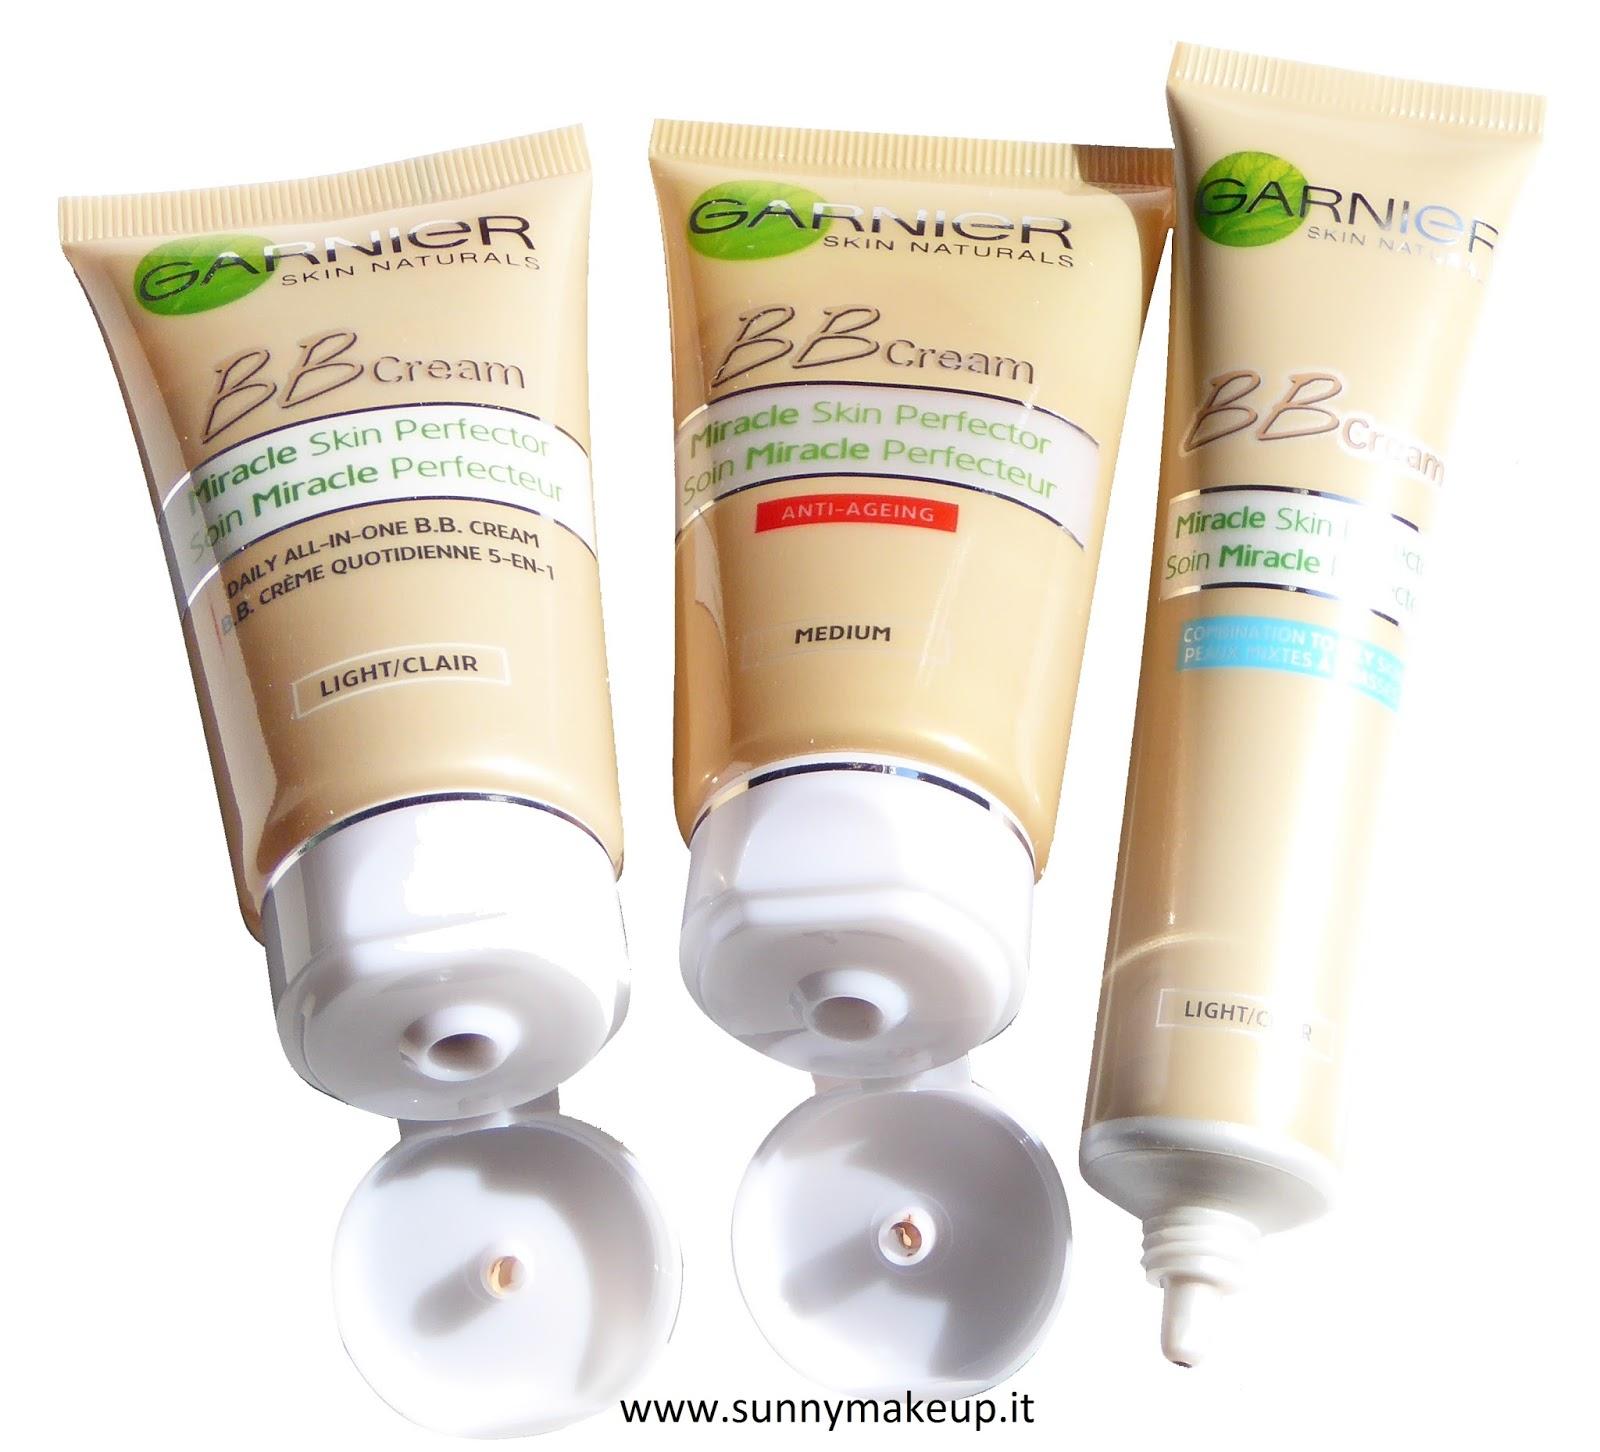 Garnier - BB Cream per  pelli normali miste/grasse e antirughe